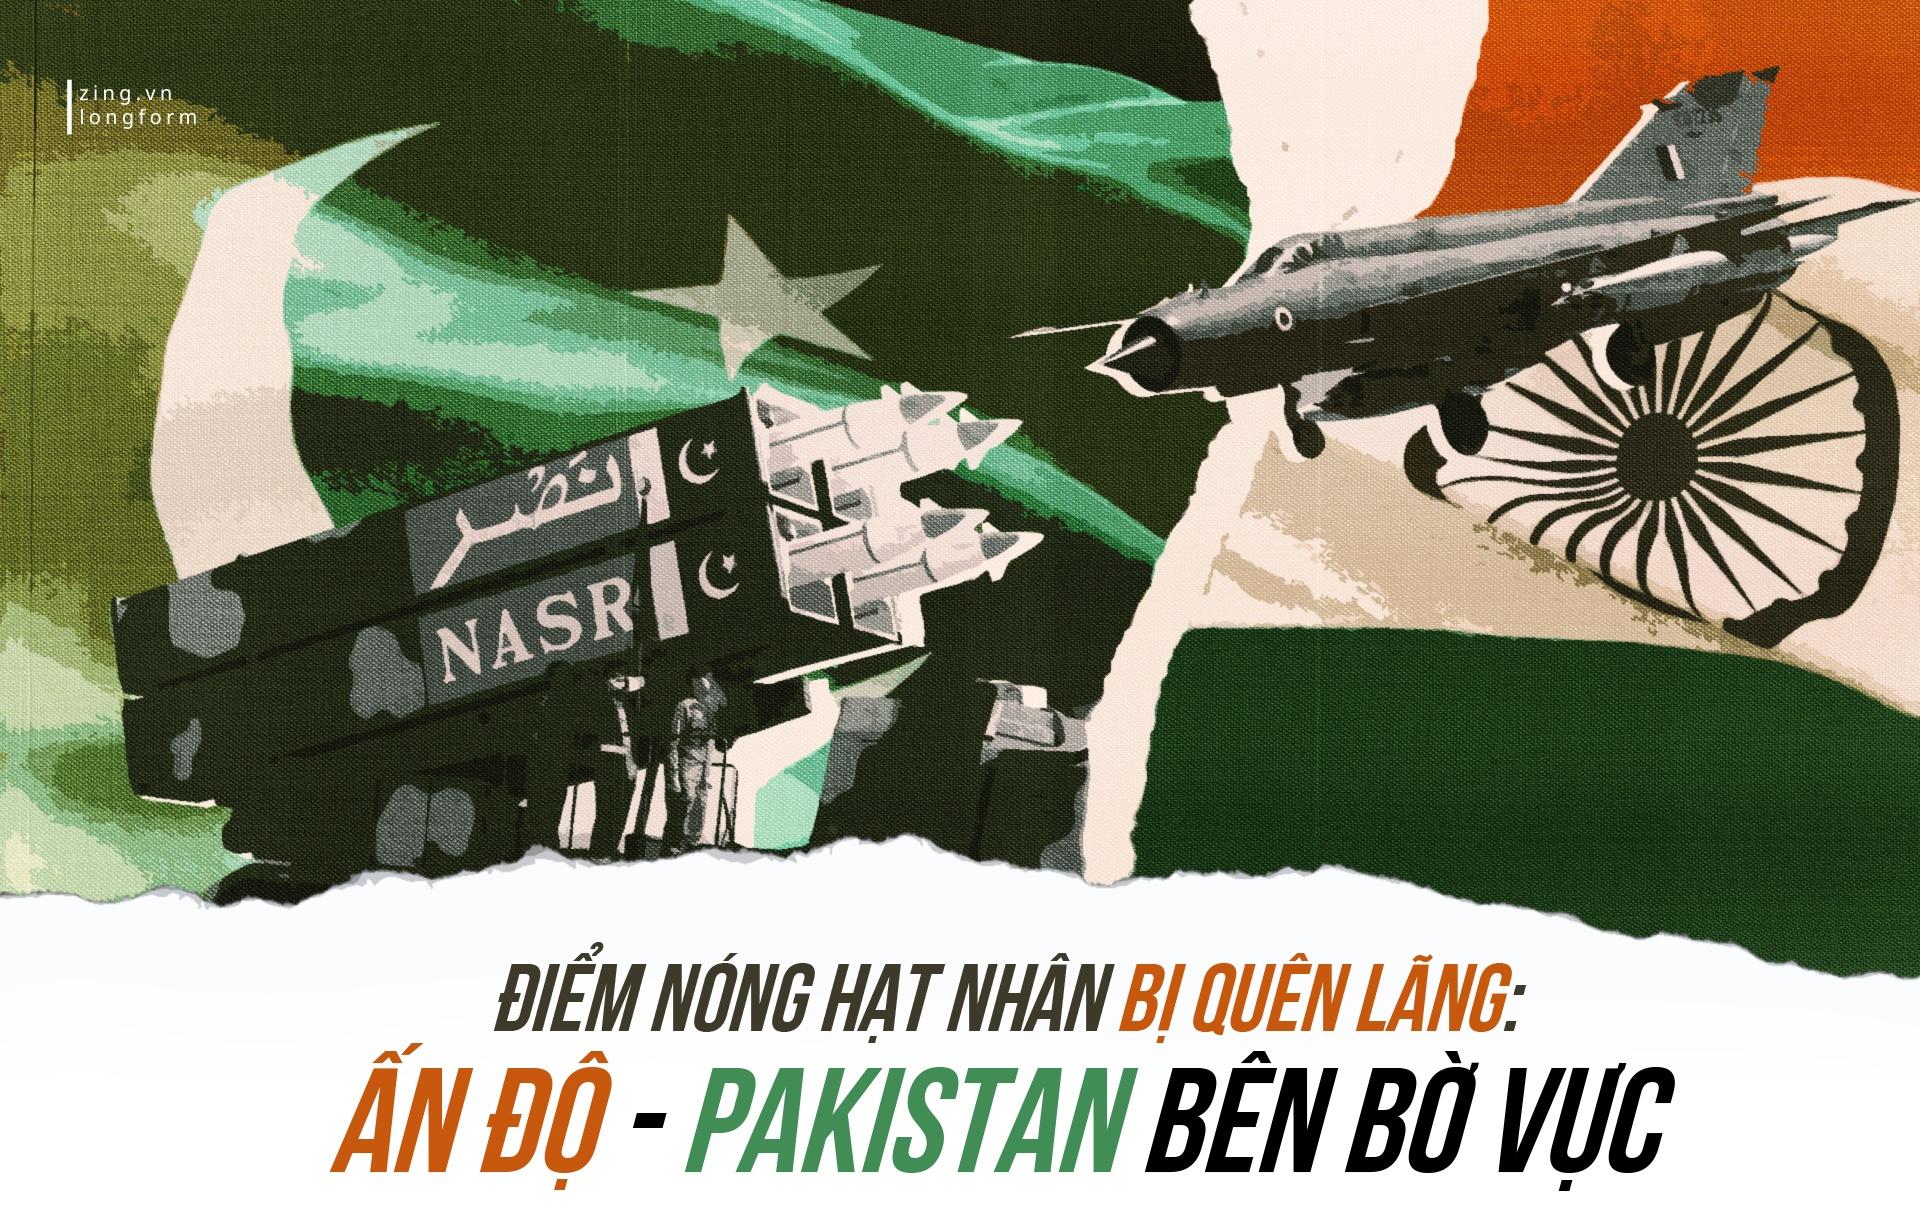 Ban ha tiem kich, An Do - Pakistan ben bo vuc chien tranh hat nhan hinh anh 2